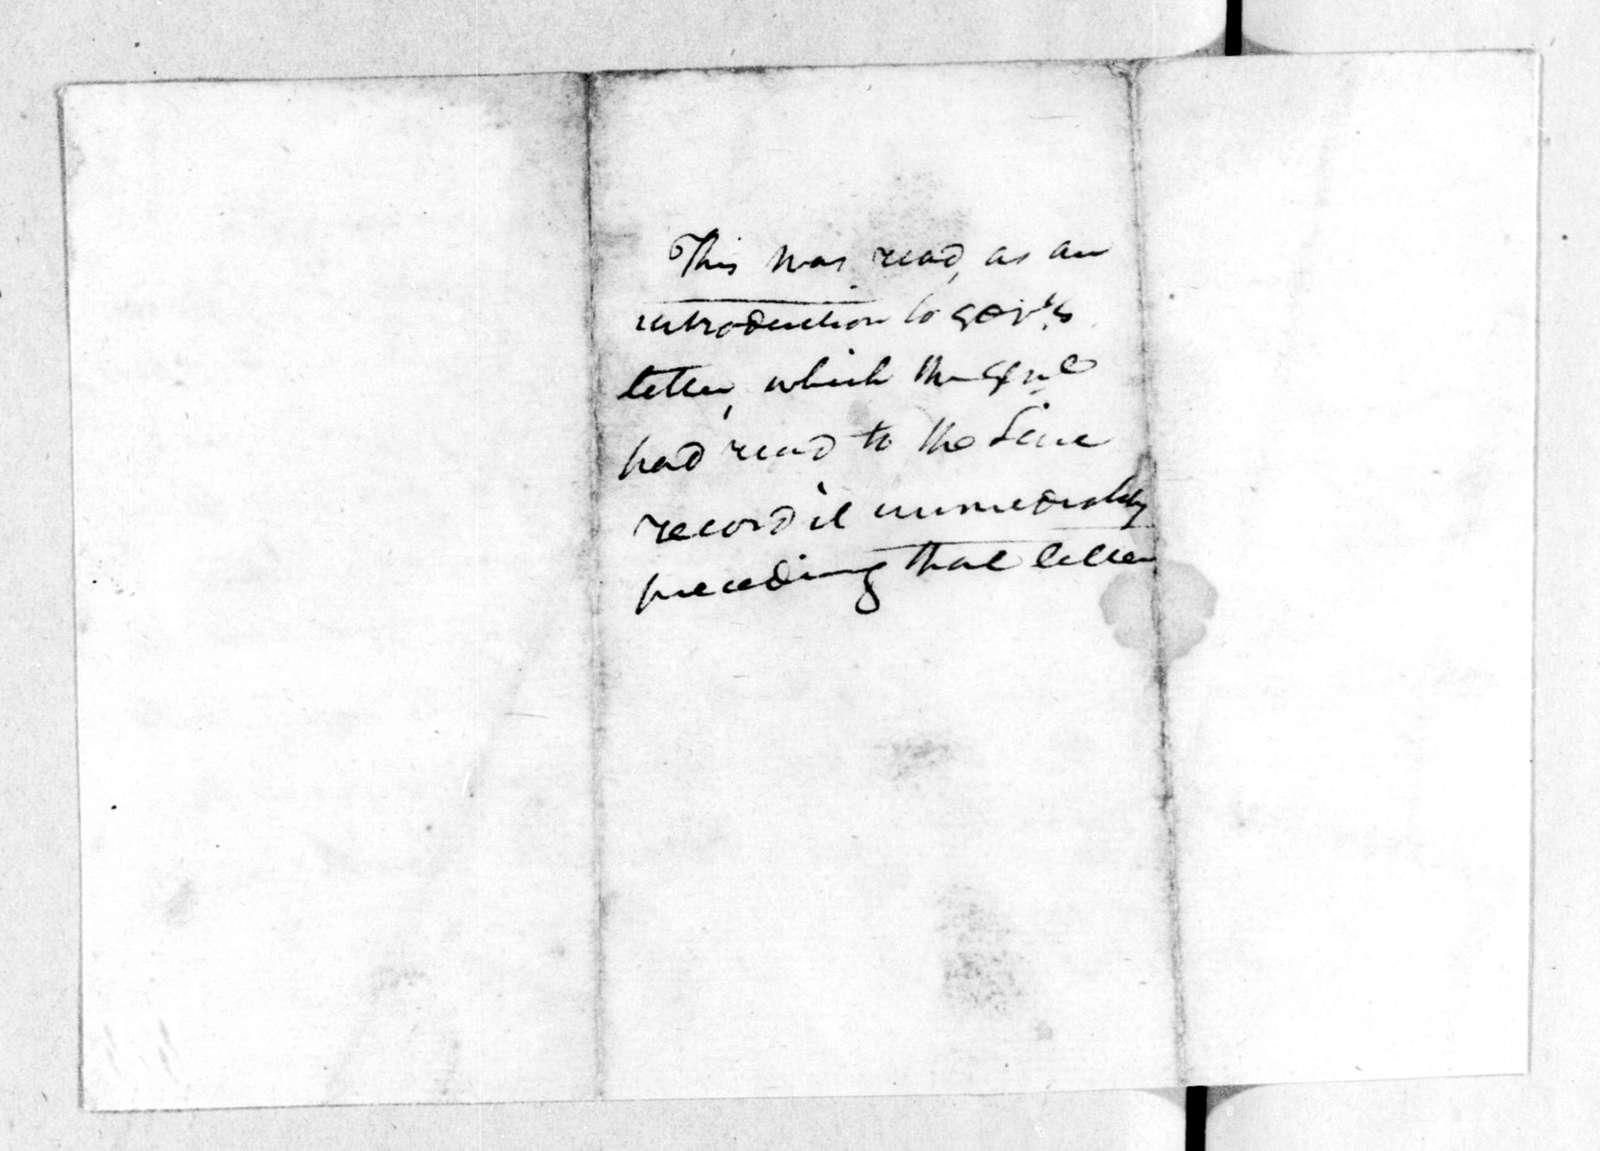 Andrew Jackson to Tennessee Volunteer Brigade, December 2, 1813